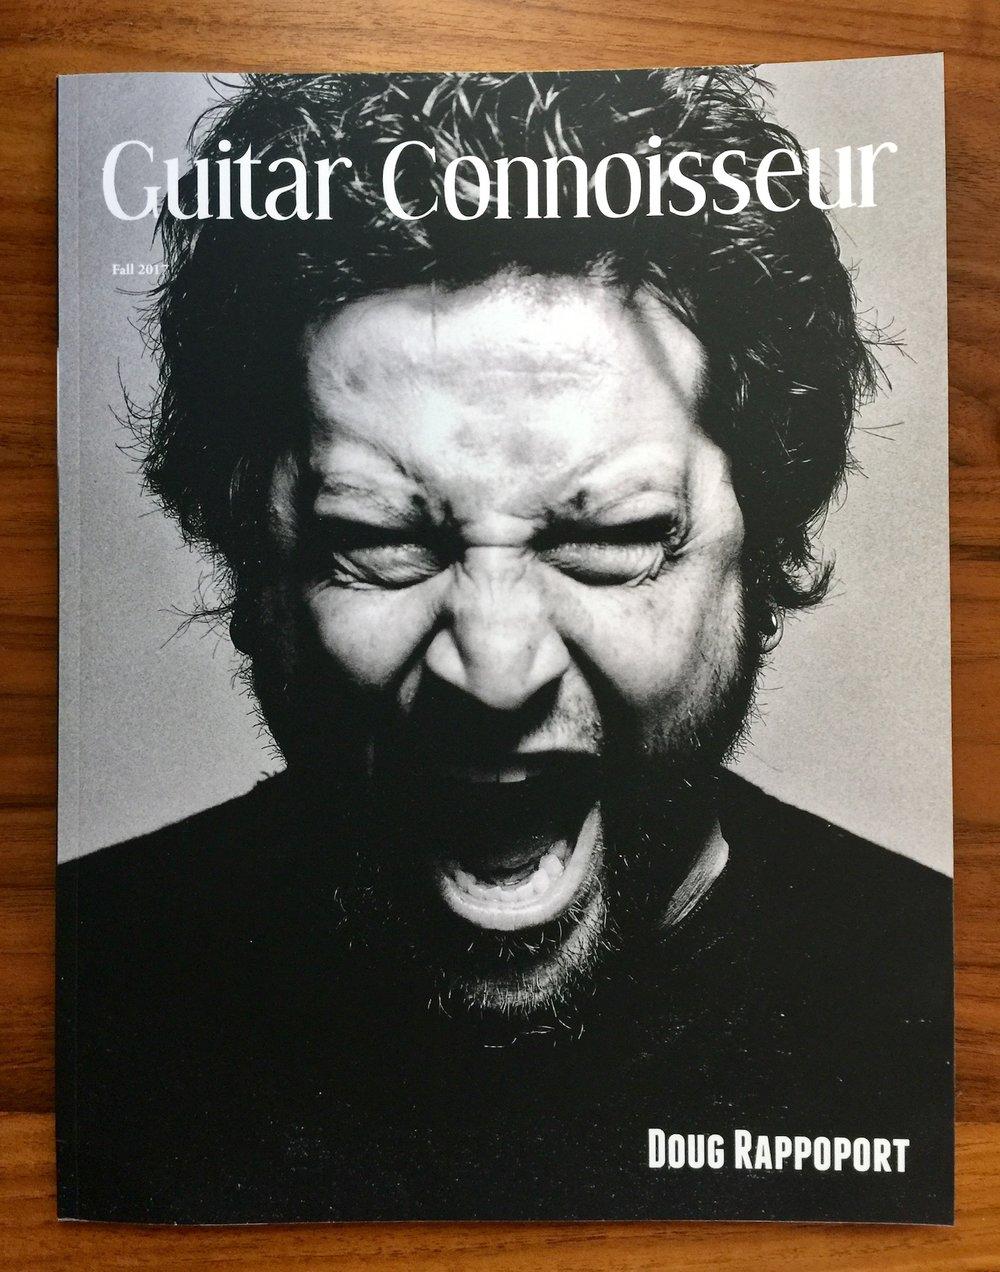 doug rappoport cover guitar connoisseur by greg vorobiov.jpg